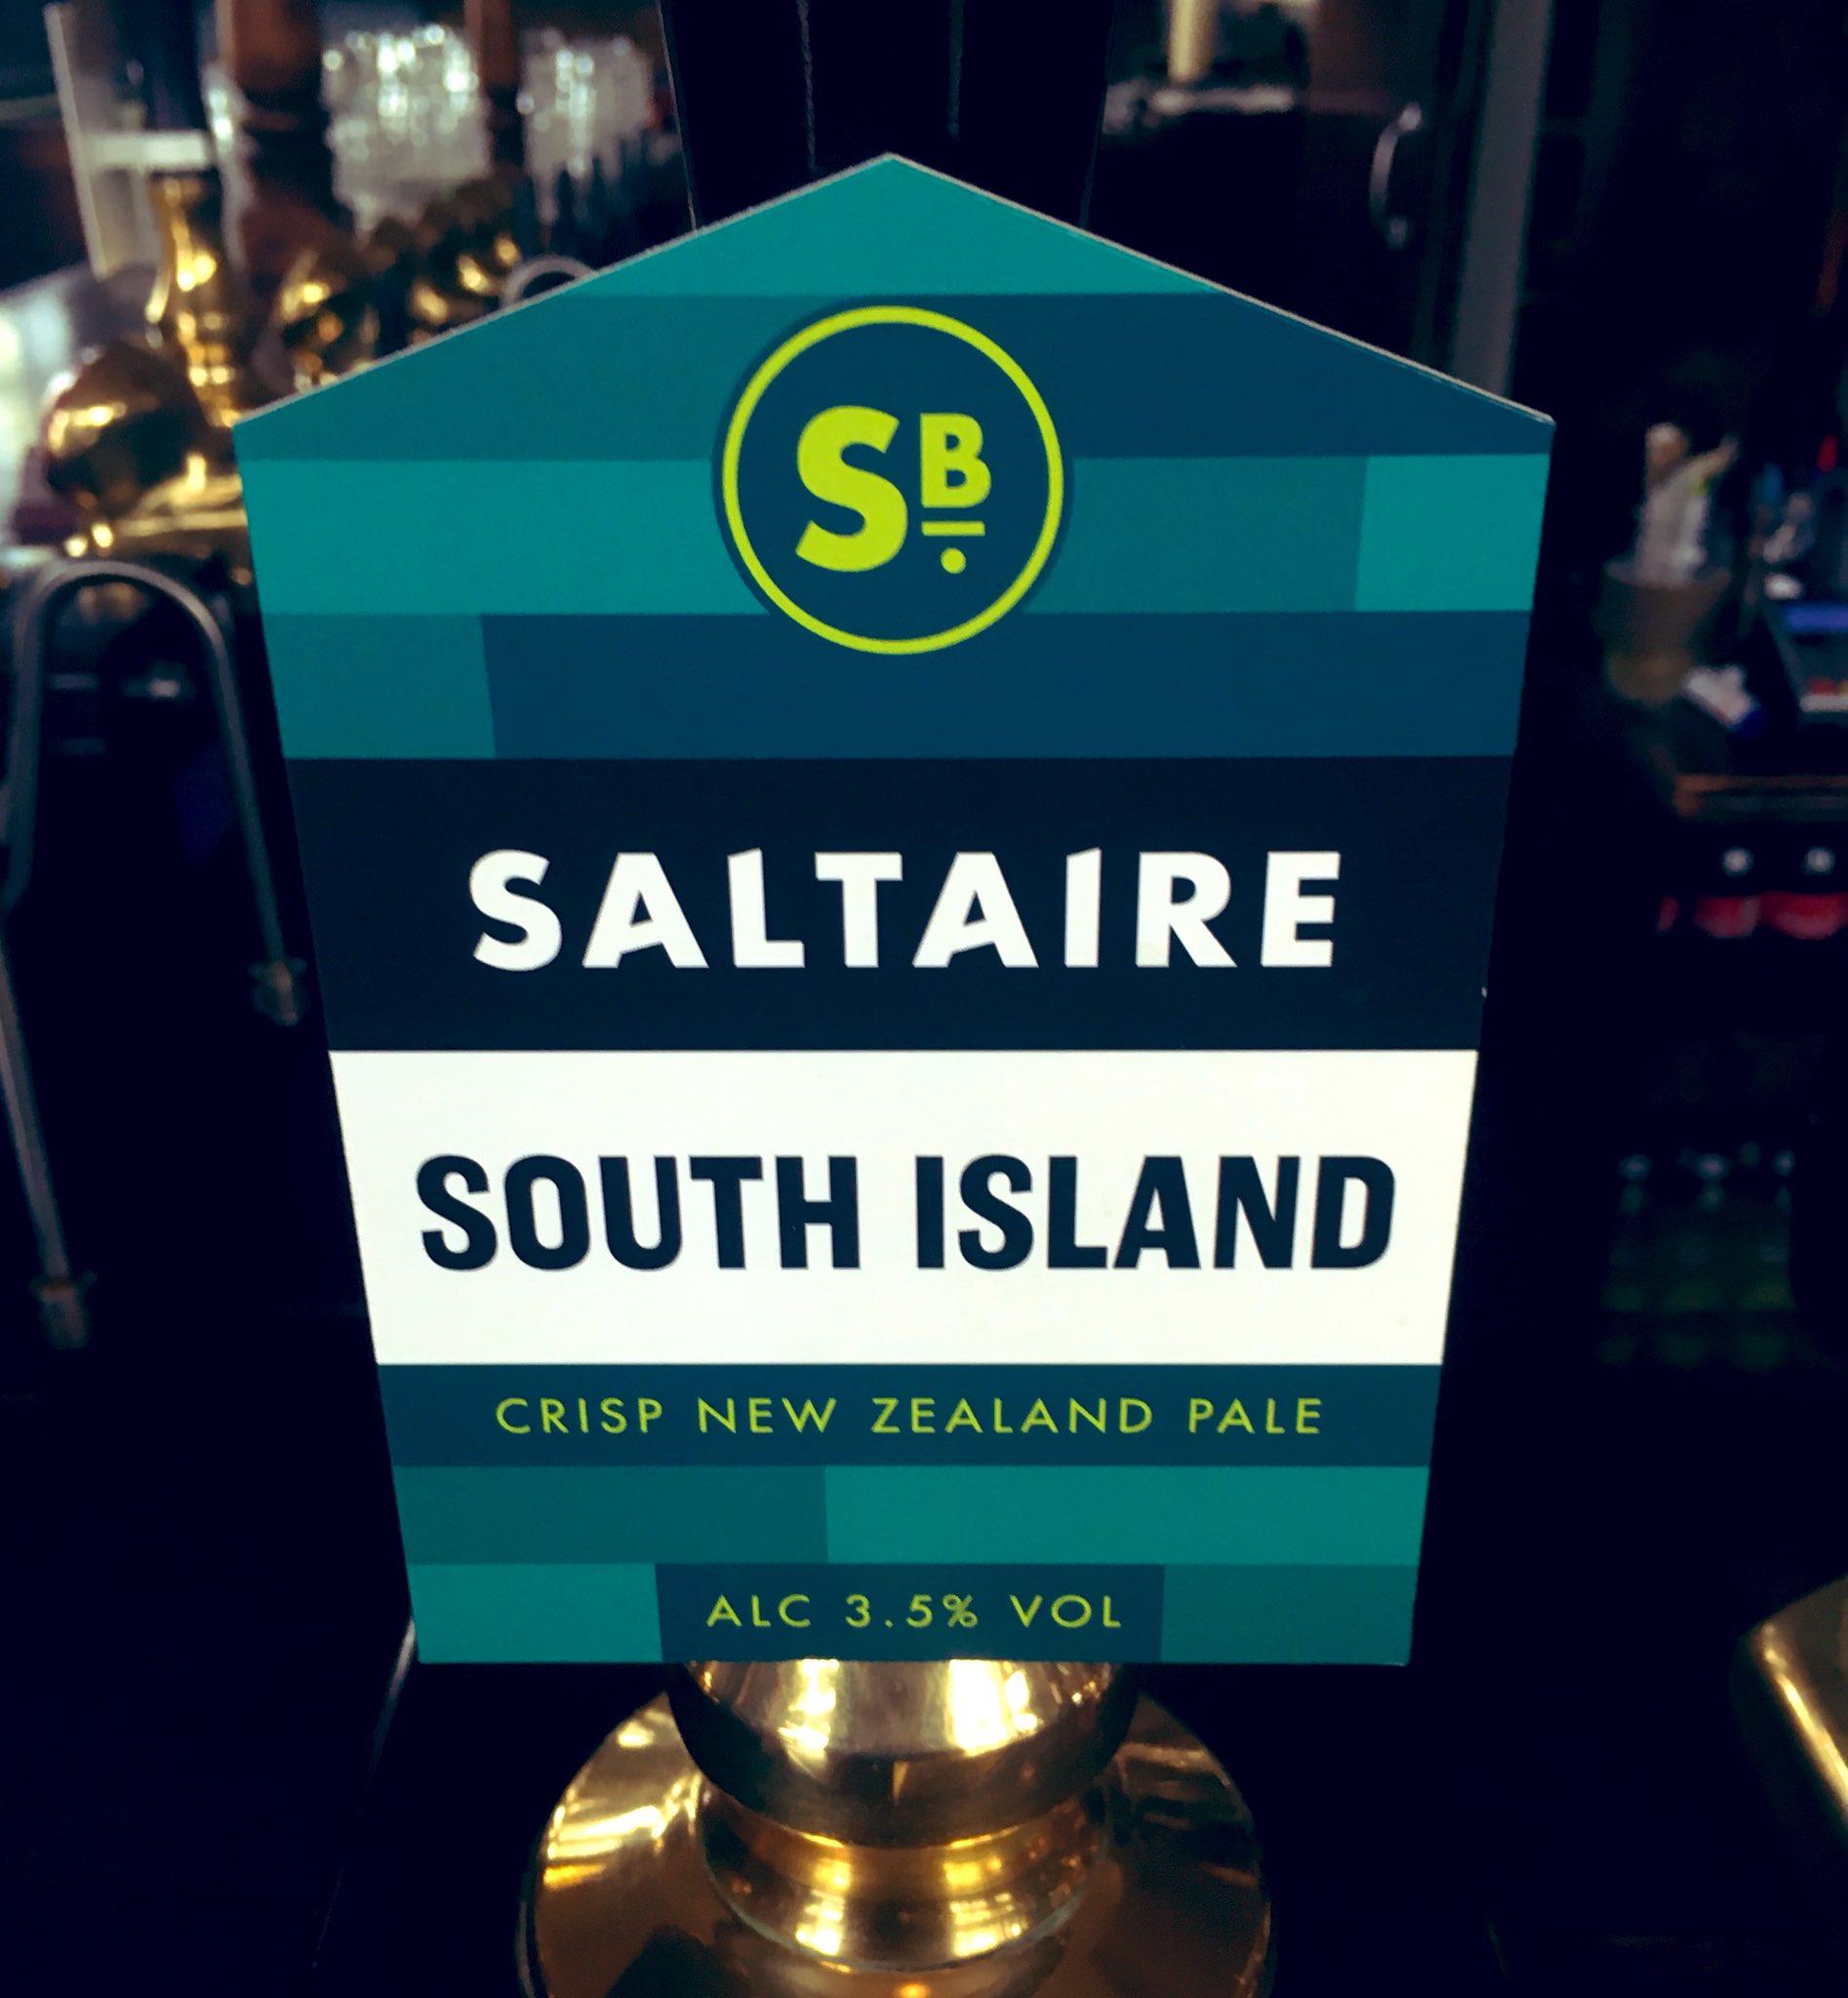 190: South Island